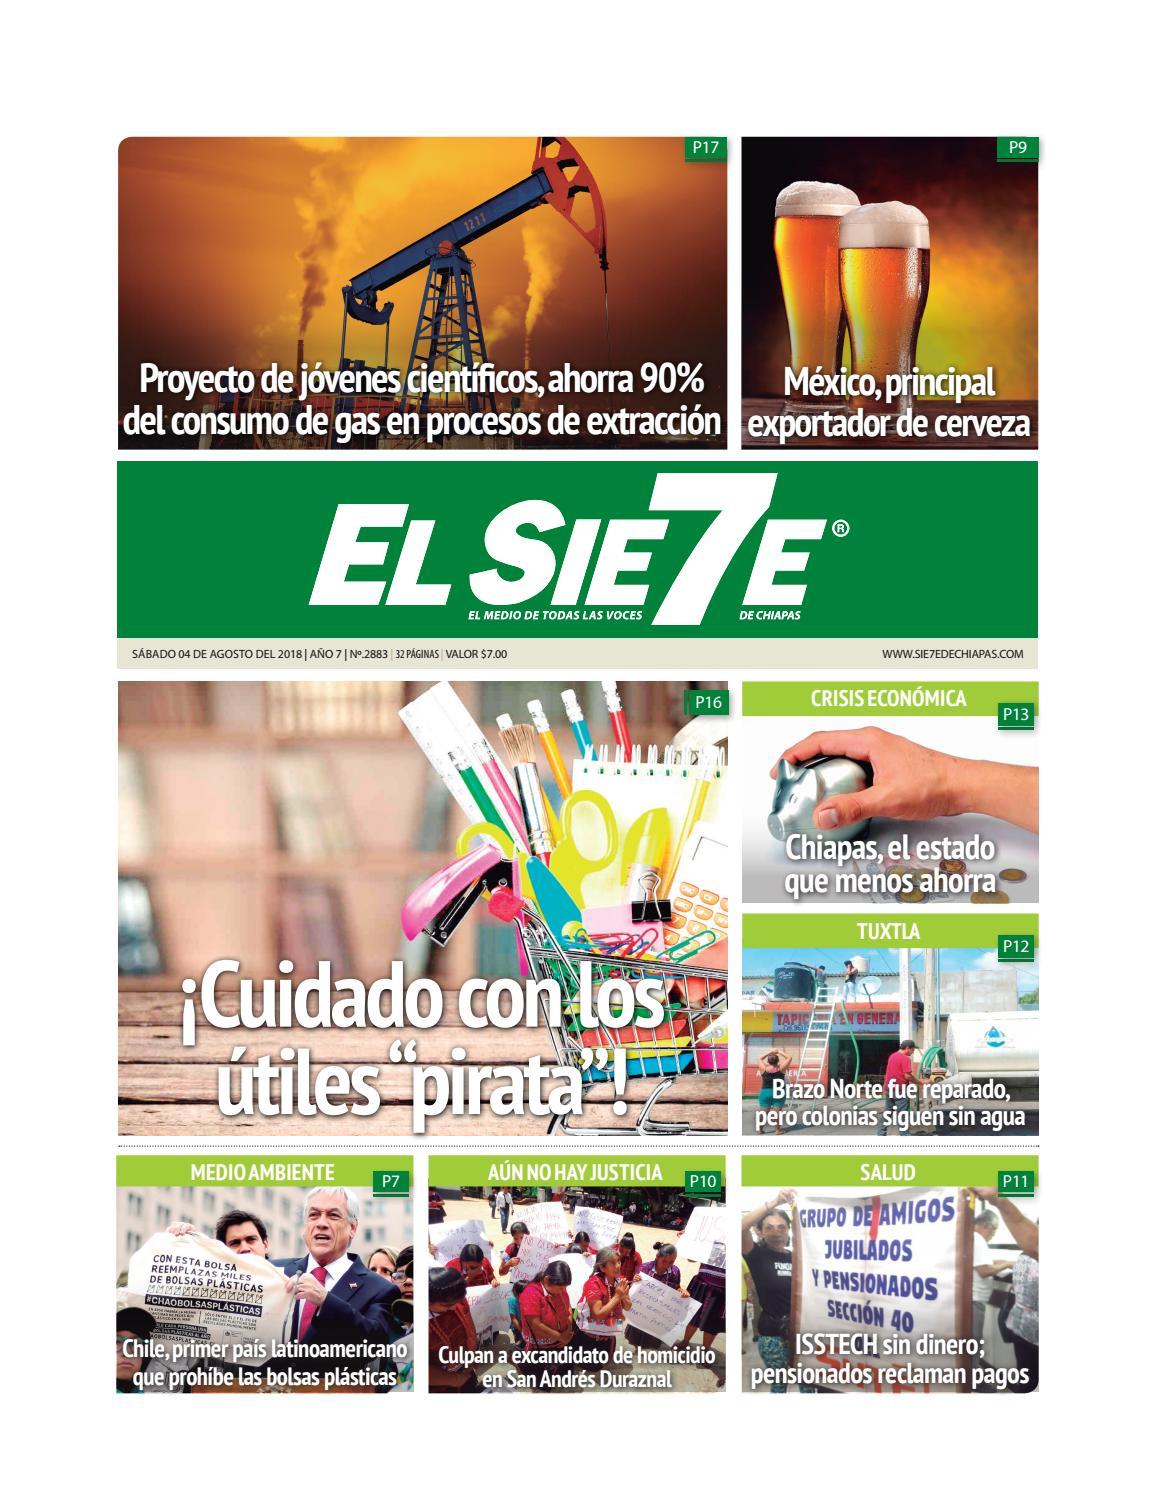 By De El Chiapas Issuu 040818 Sie7e QBeWrCxdo